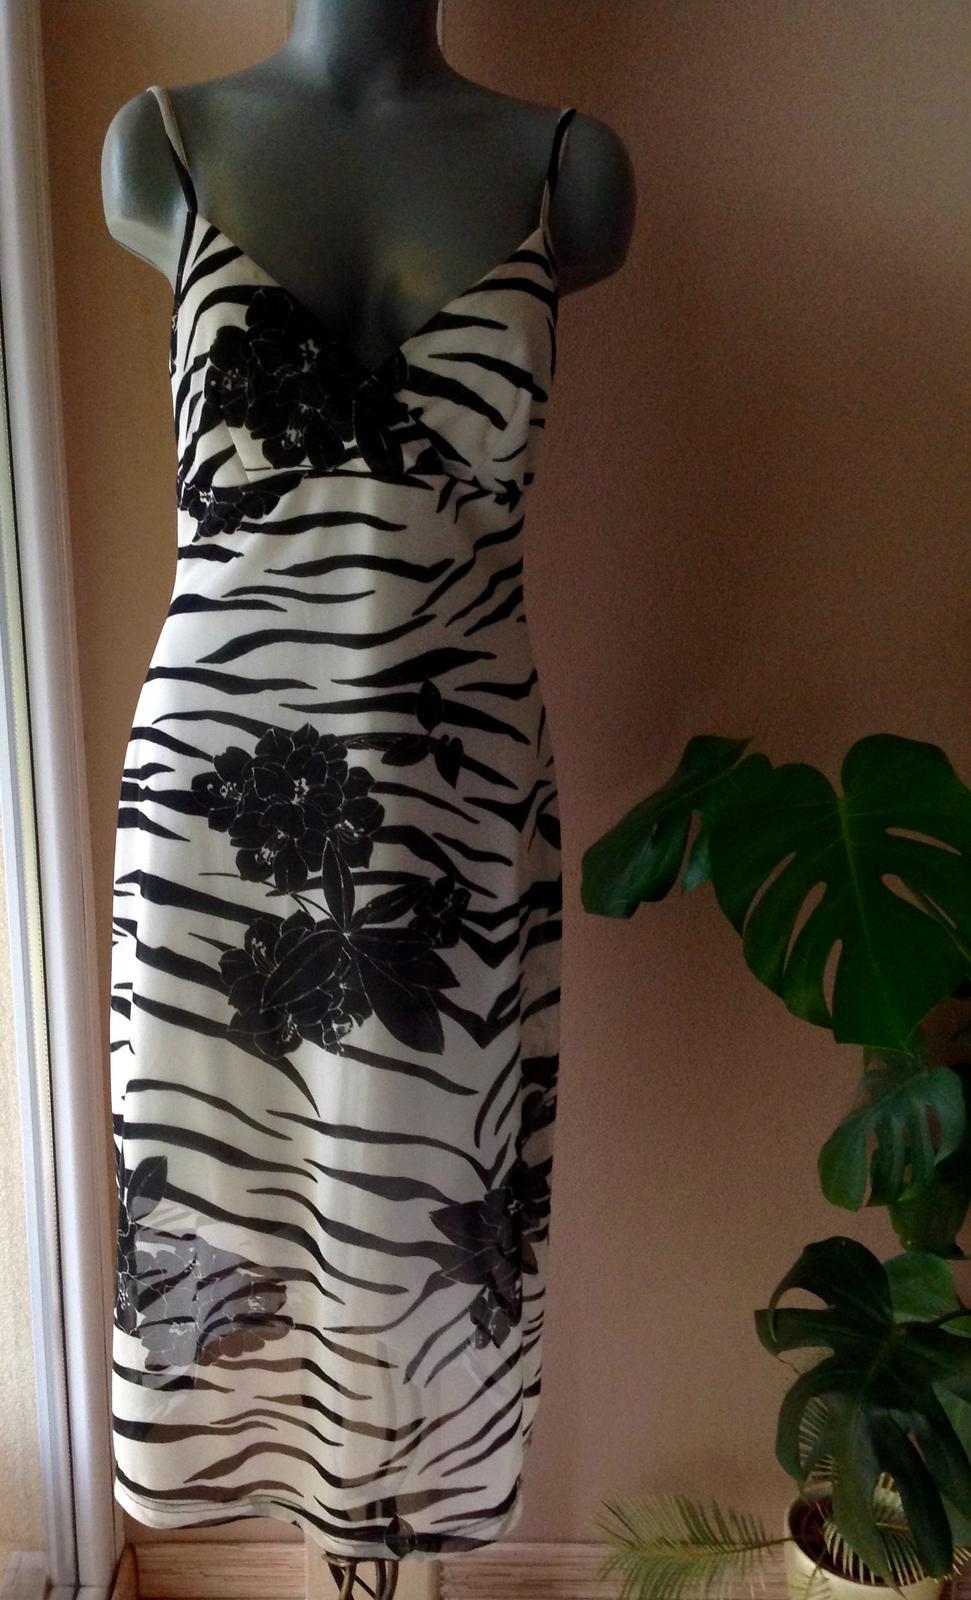 Pružné šaty oasis - Obrázok č. 1